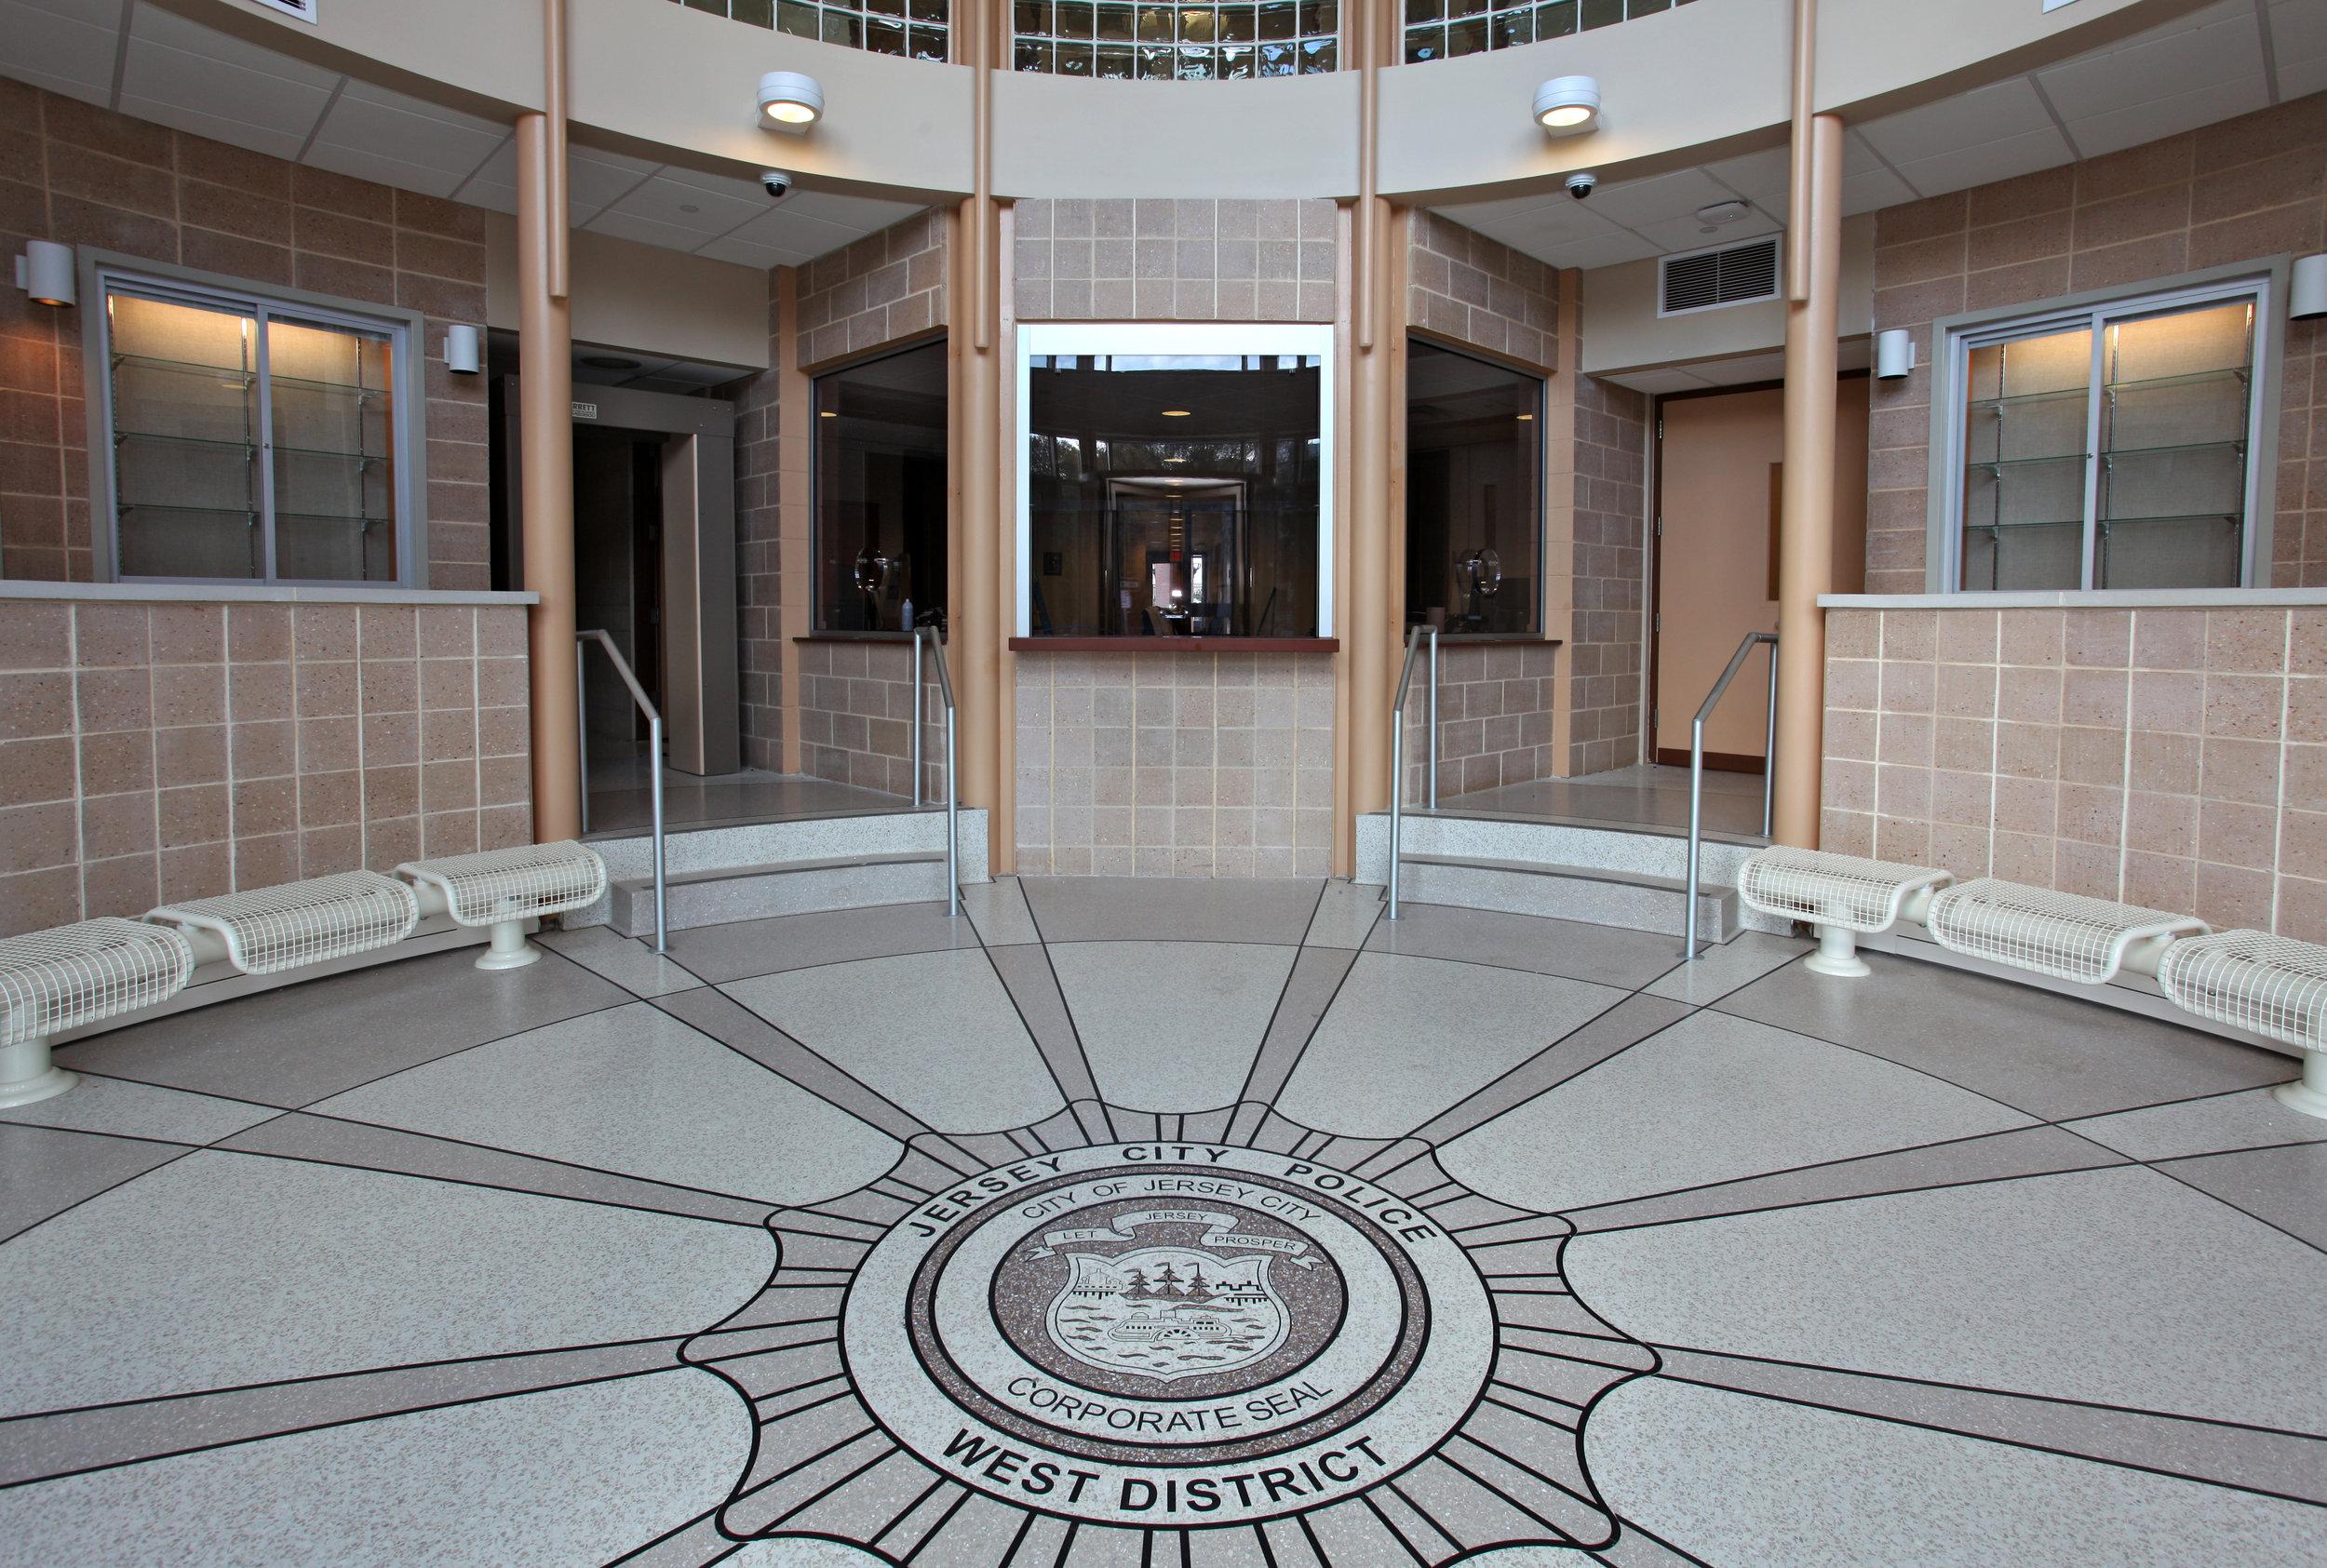 JCPD - 6 - High-Rez - Lobby Floor.jpg